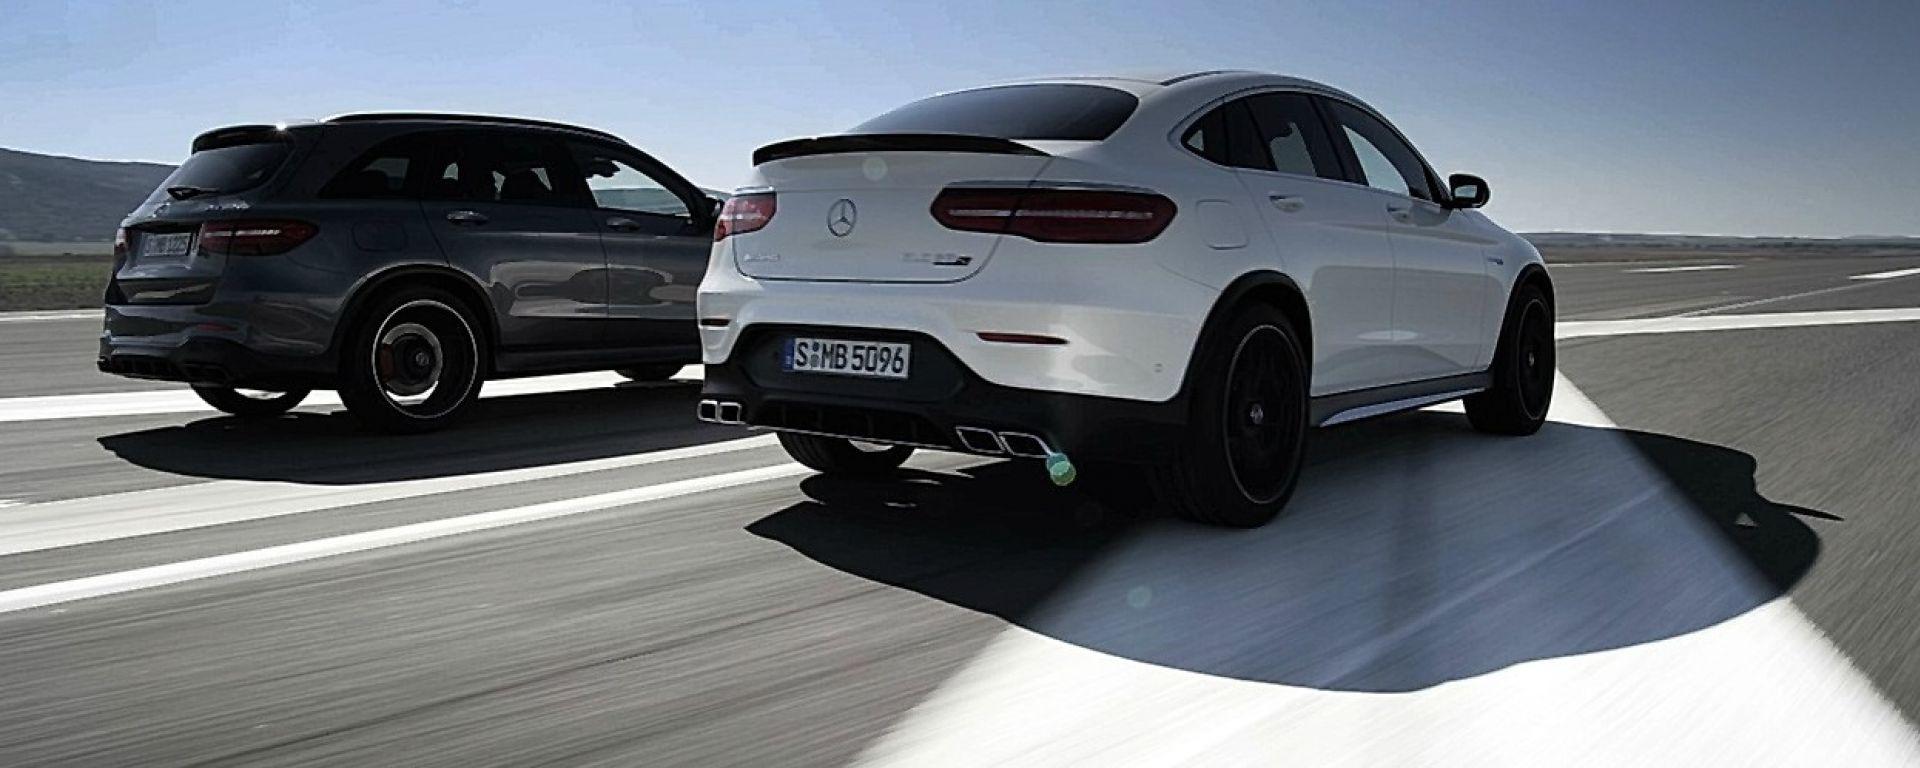 Mercedes-AMG GLC 63 4MATIC+ e Coupé: ora c'è il video